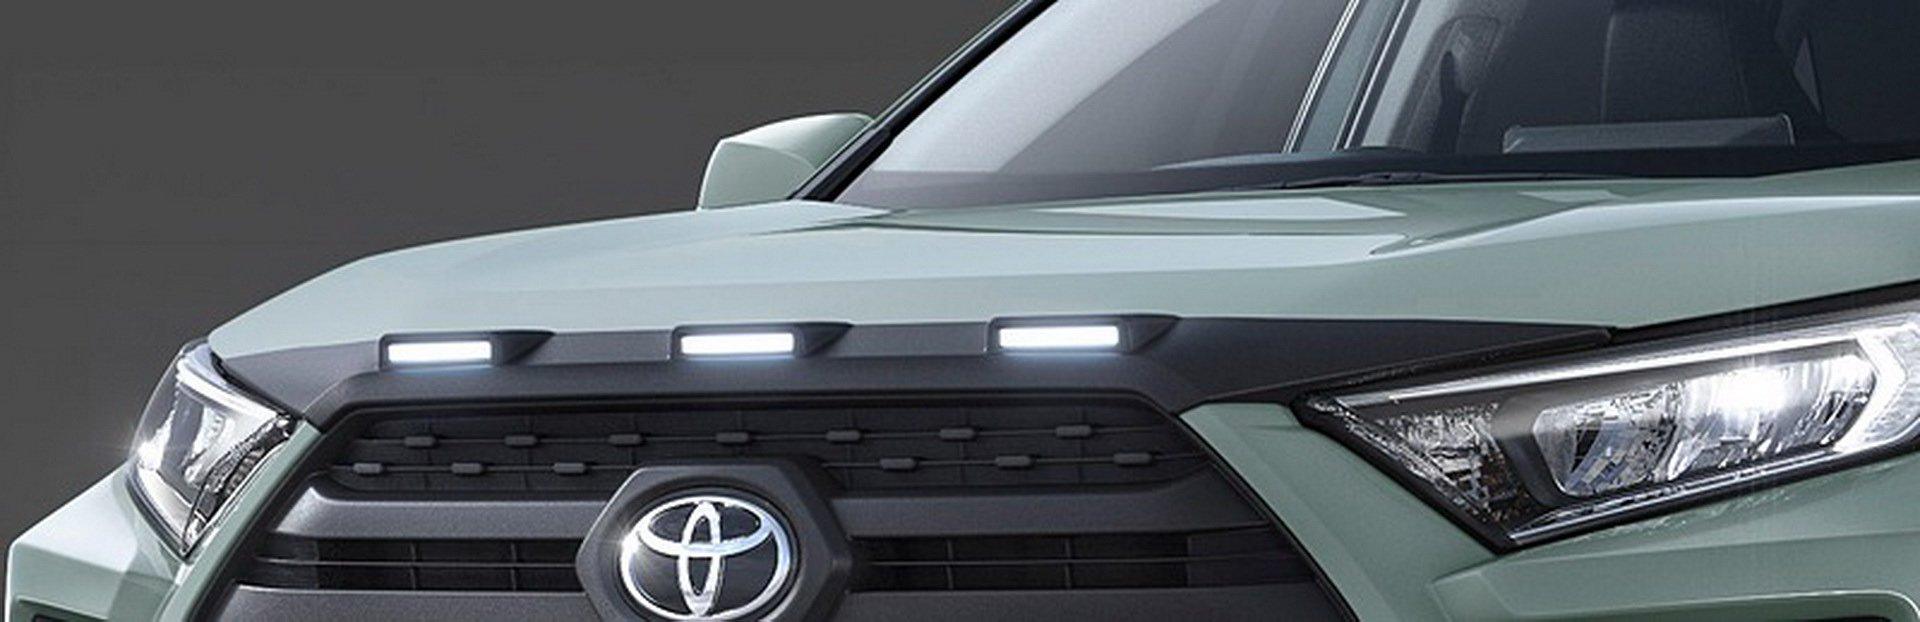 Toyota-RAV4-TRD-and-Modellista-20